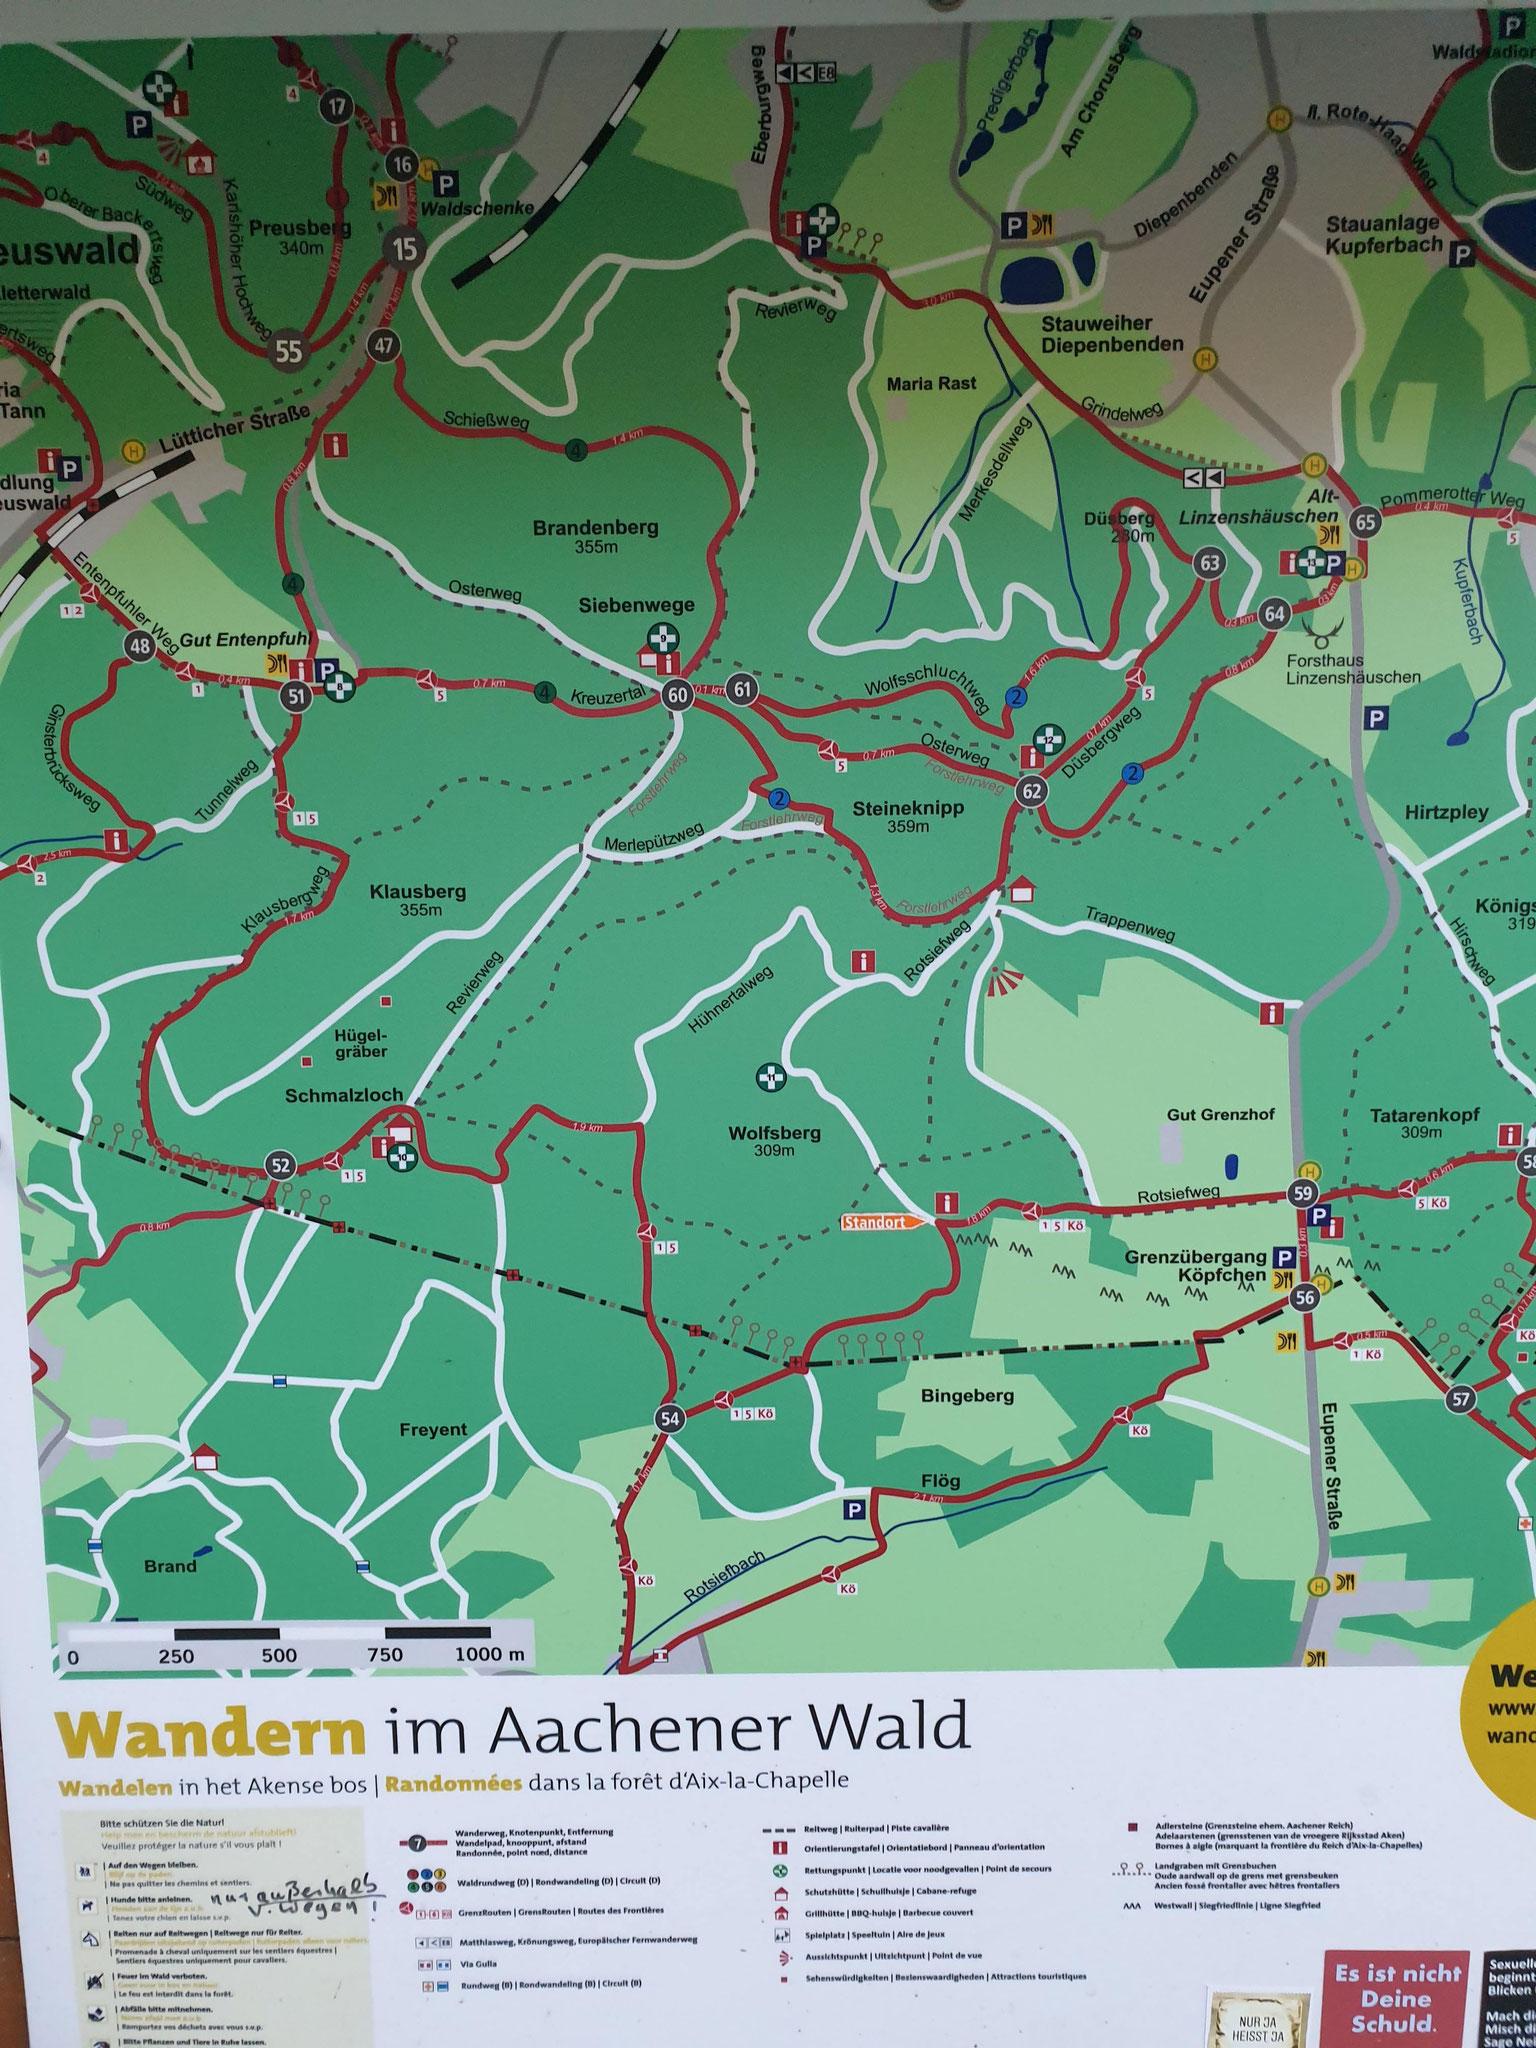 Aachener Wald am Landgraben bei Köpfchen